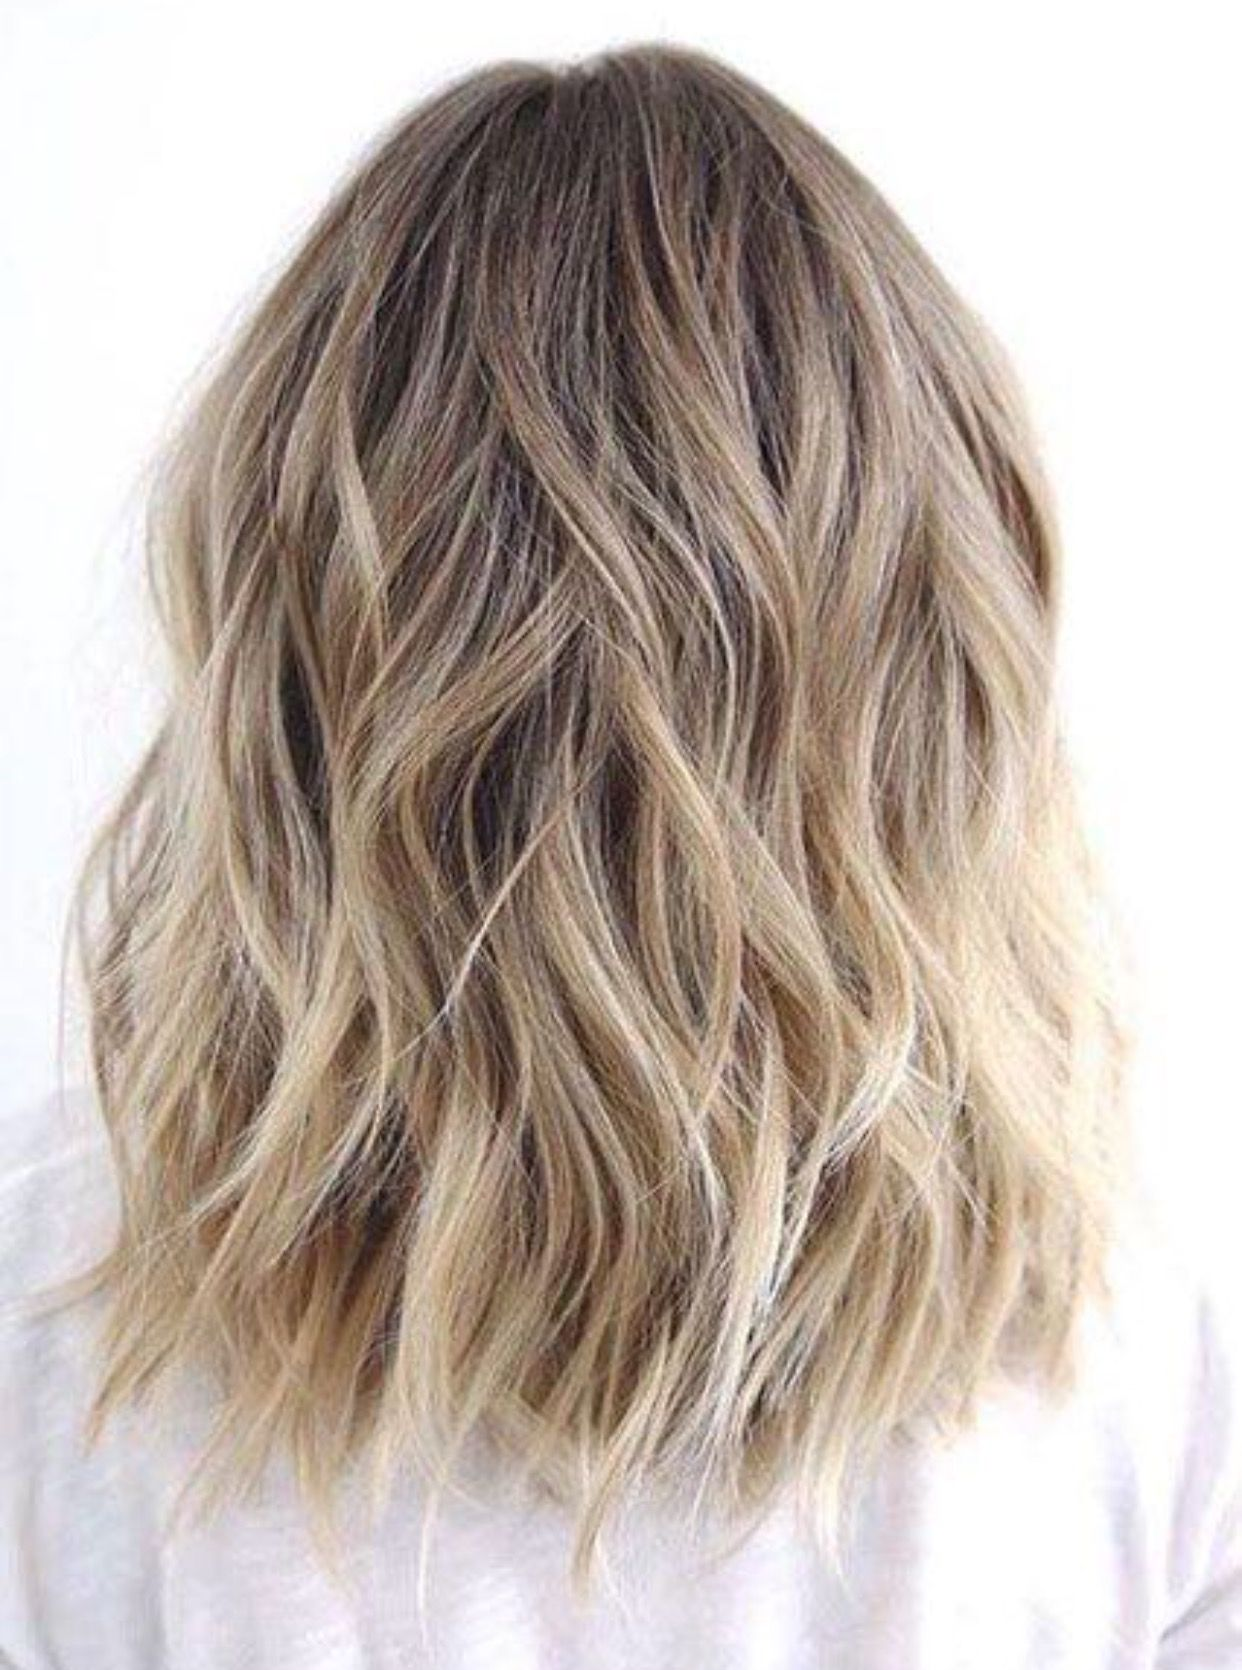 Pinterest morganjessxo h a i r pinterest hair coloring